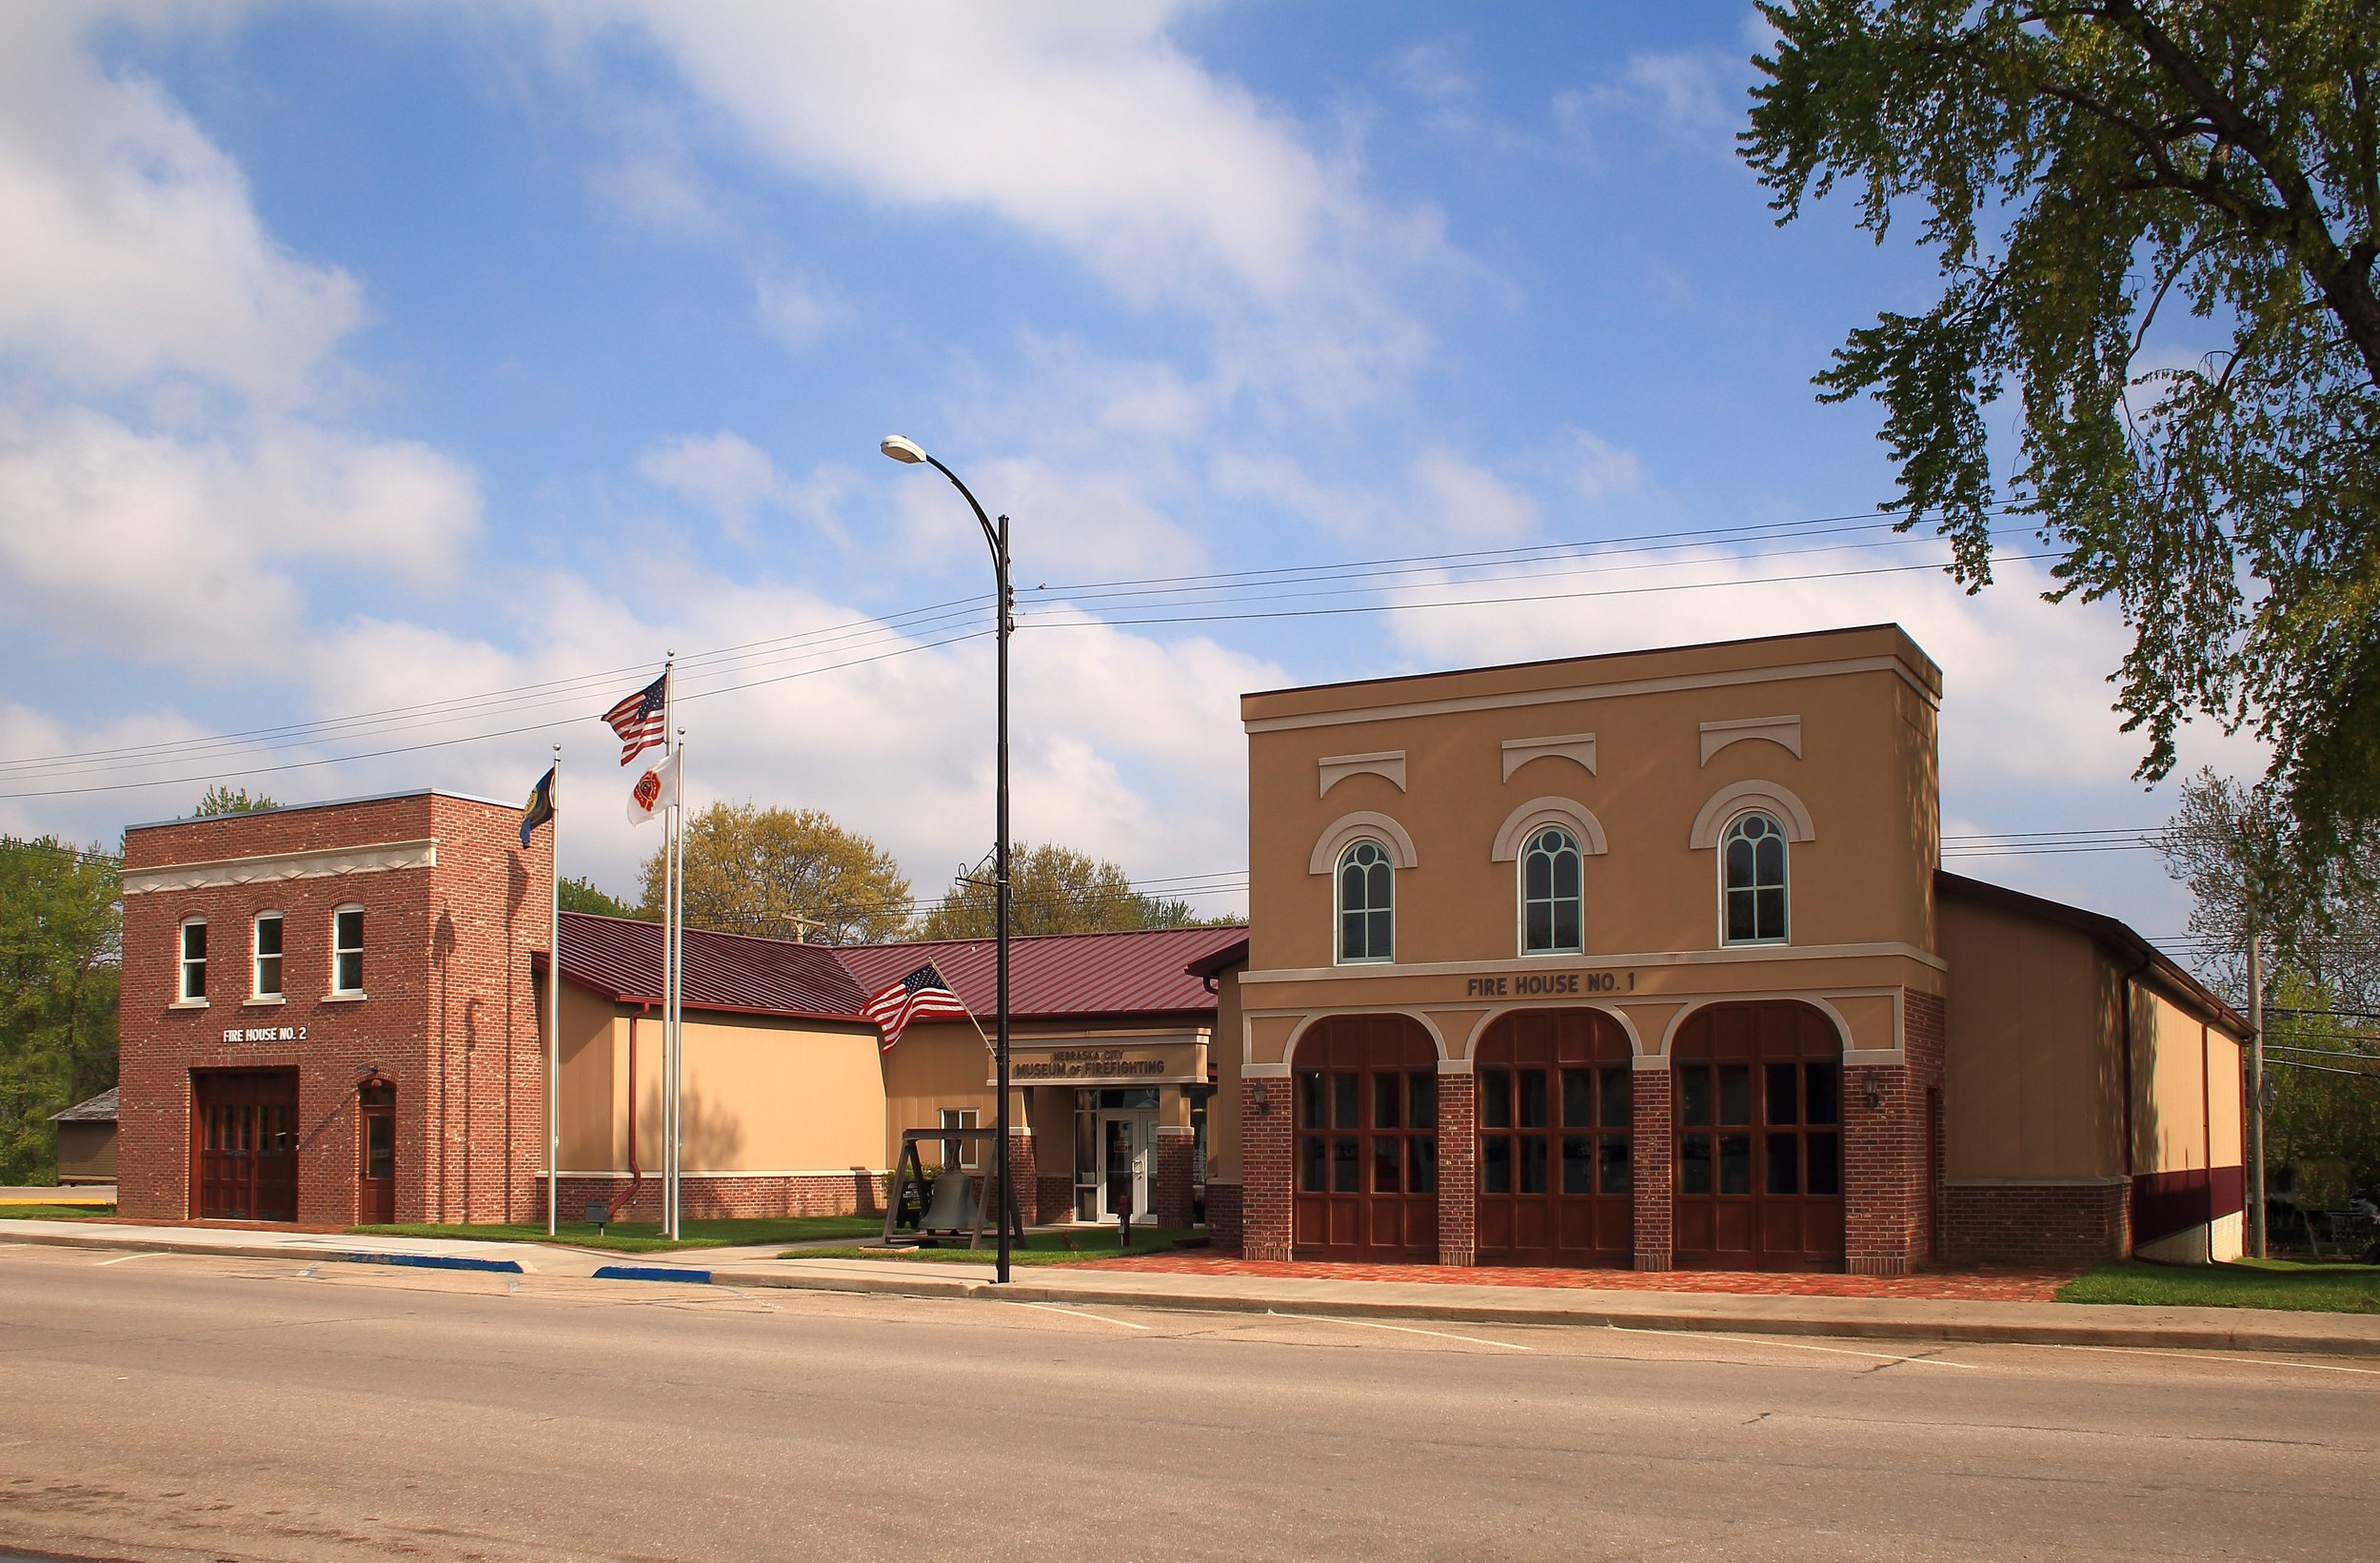 NC-Museum-of-Firefighting.JPG